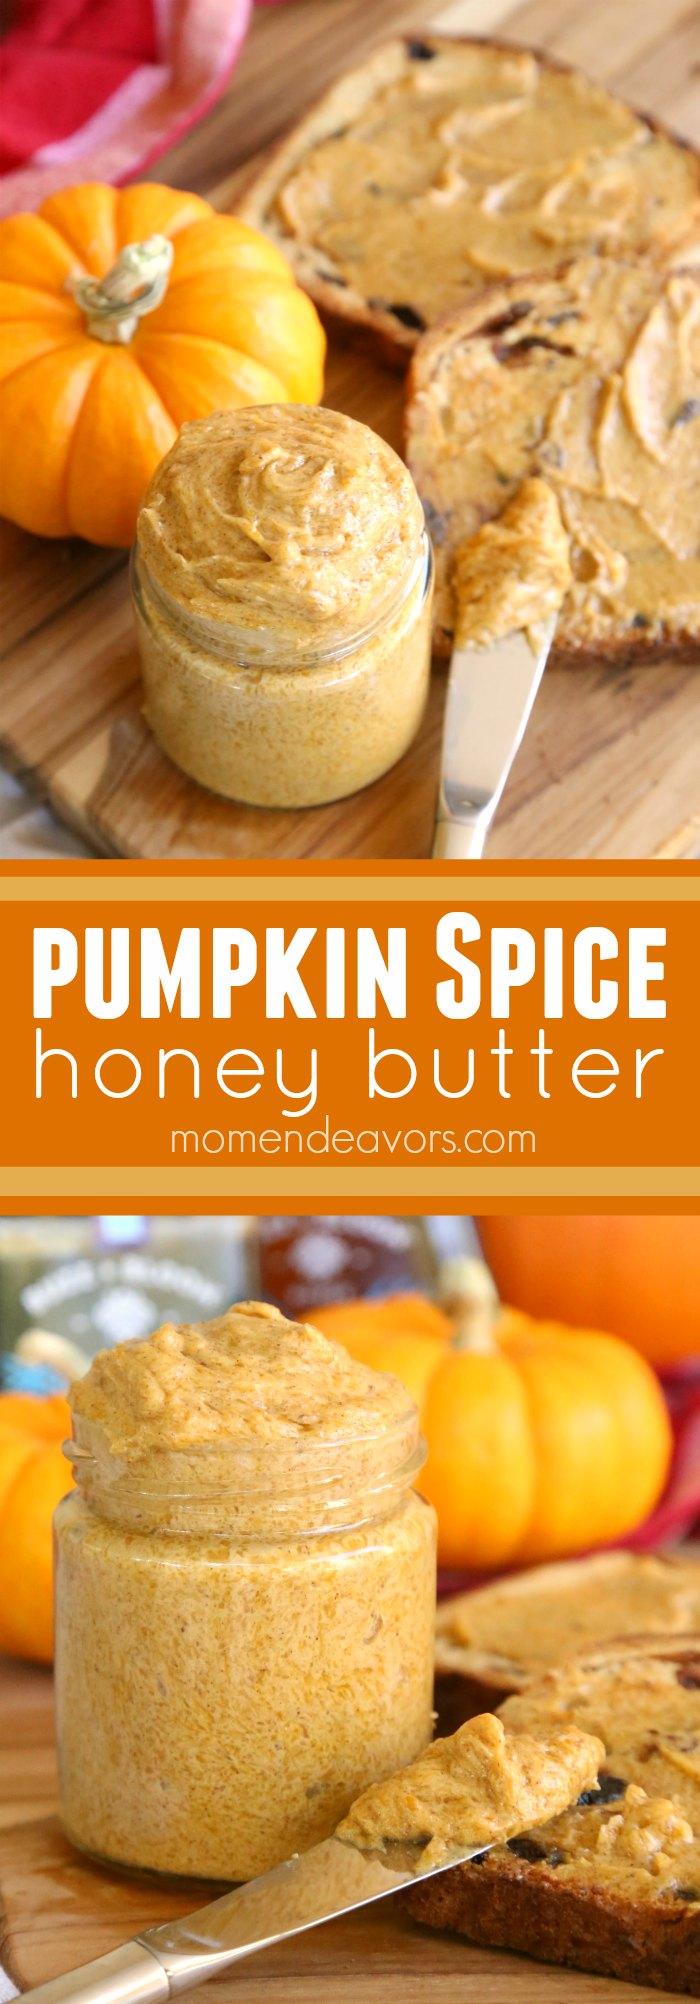 delicious-pumpkin-spice-honey-butter-recipe